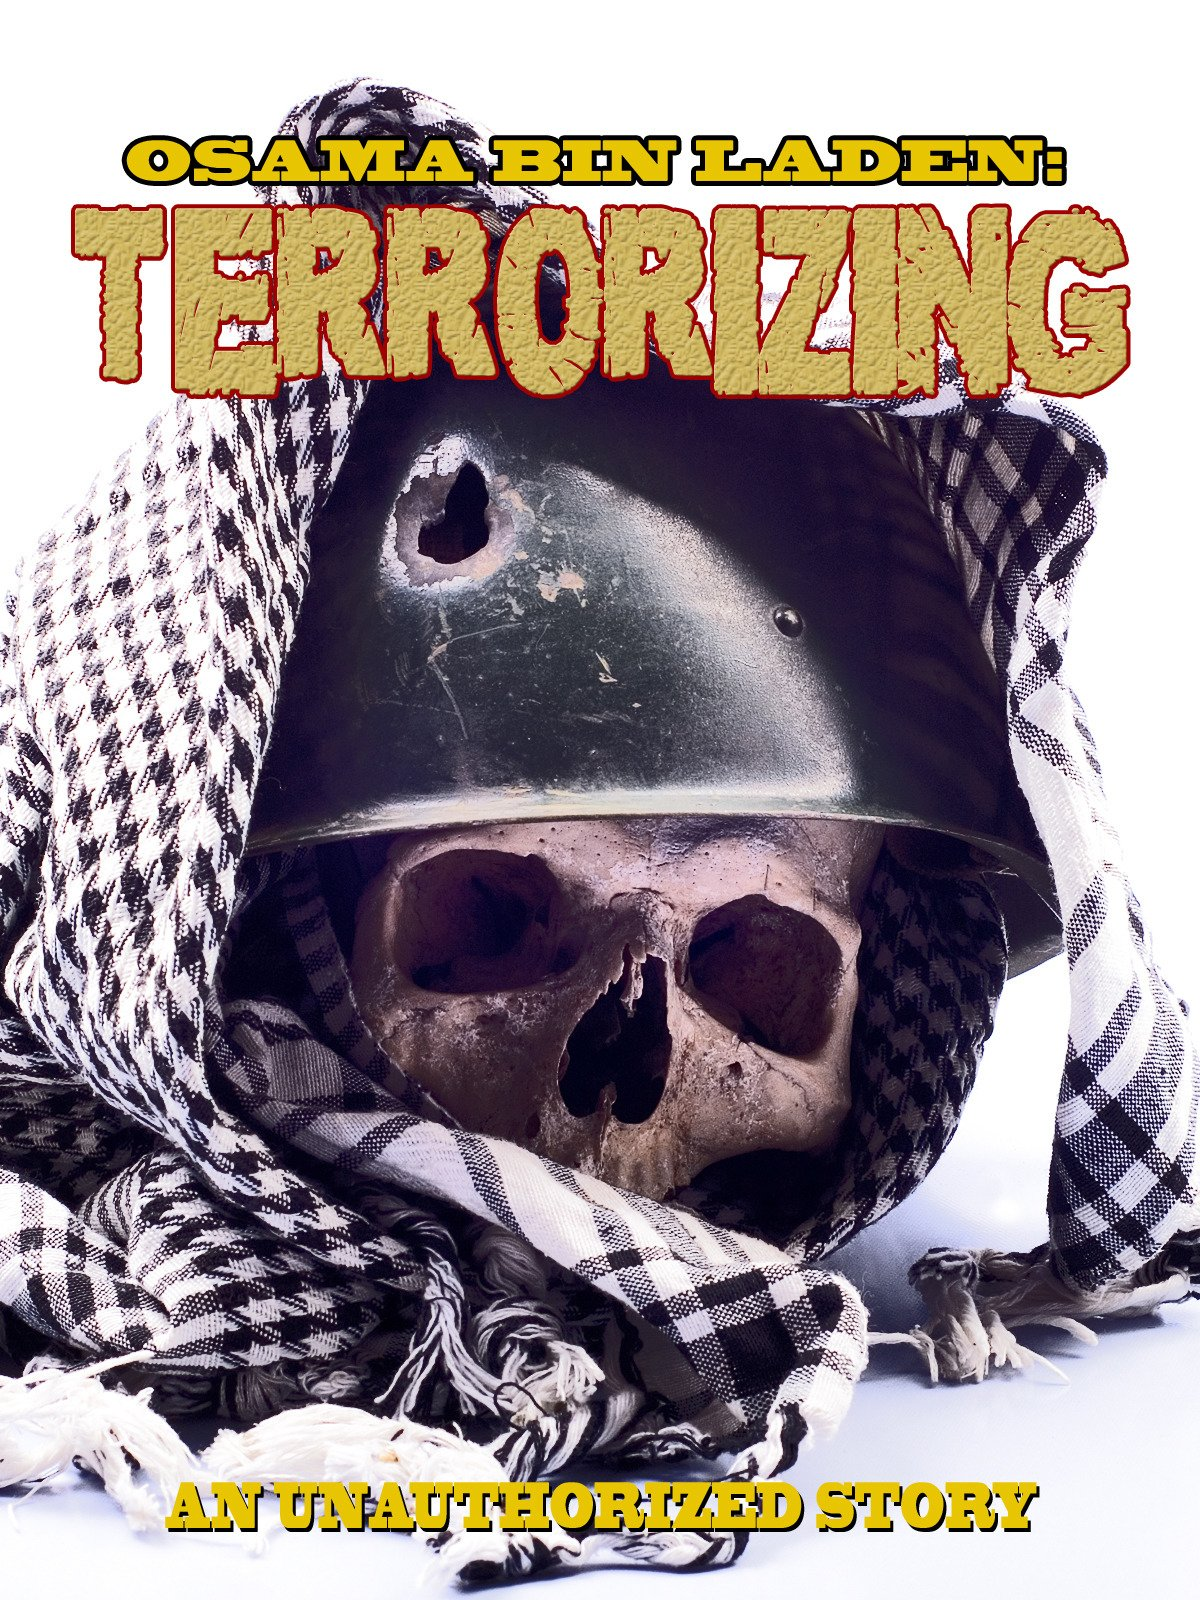 Osama Bin Laden: Terrorizing on Amazon Prime Video UK